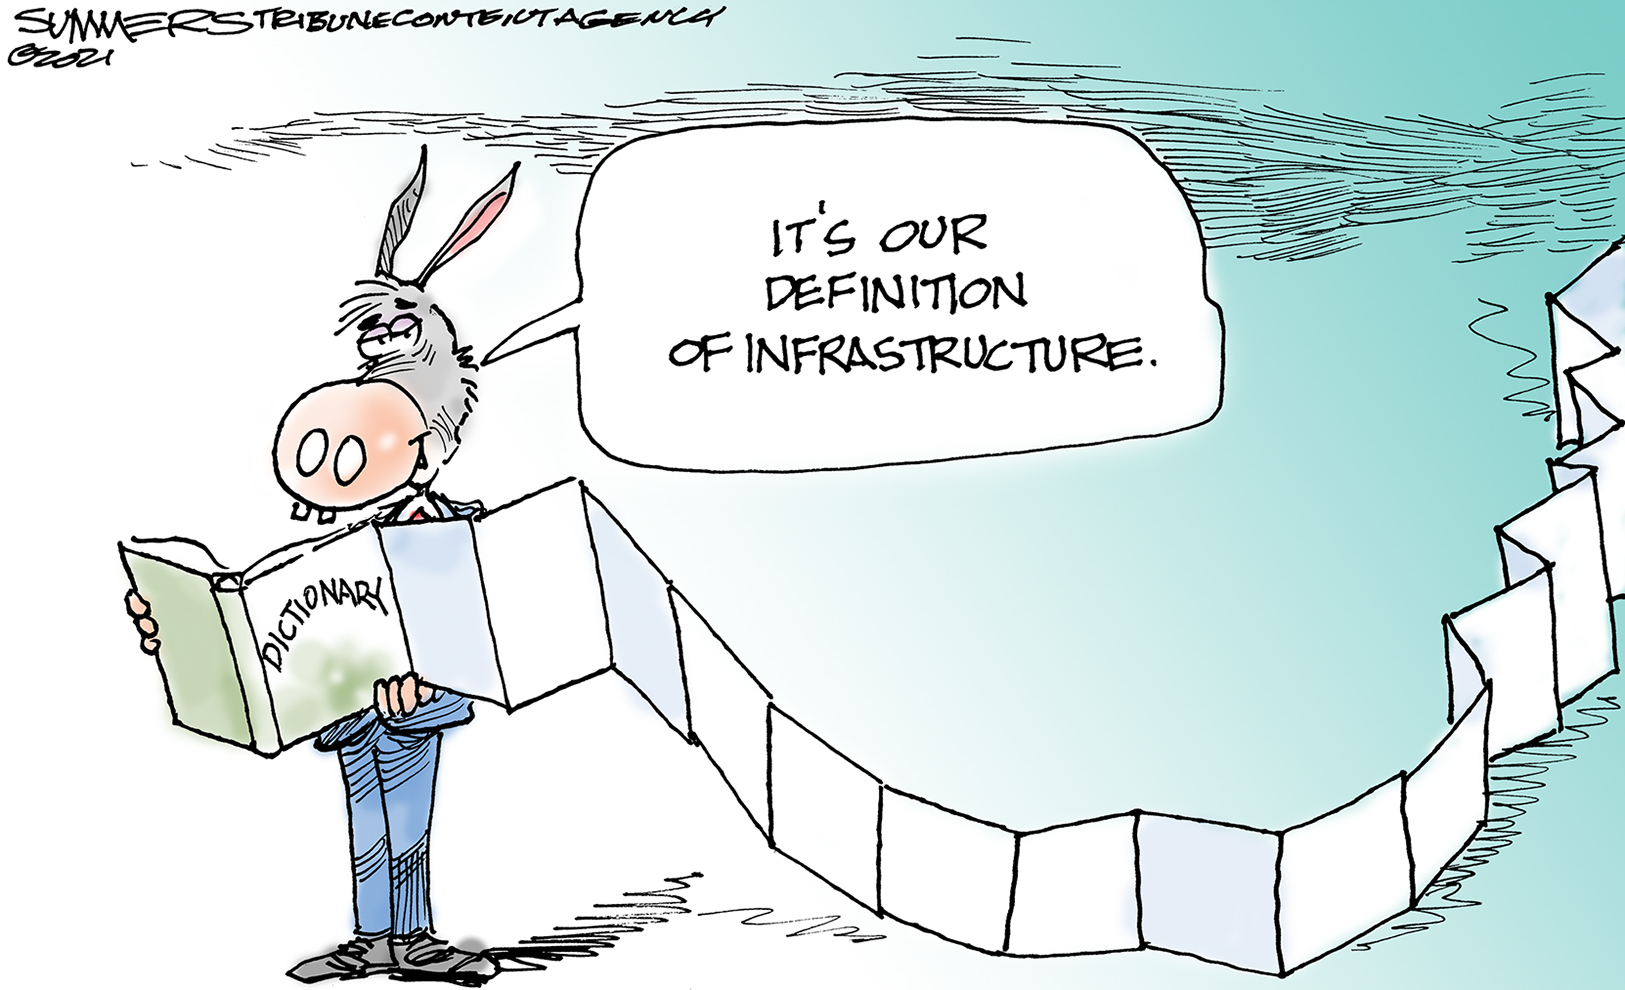 April 17: Infrastructure Bill